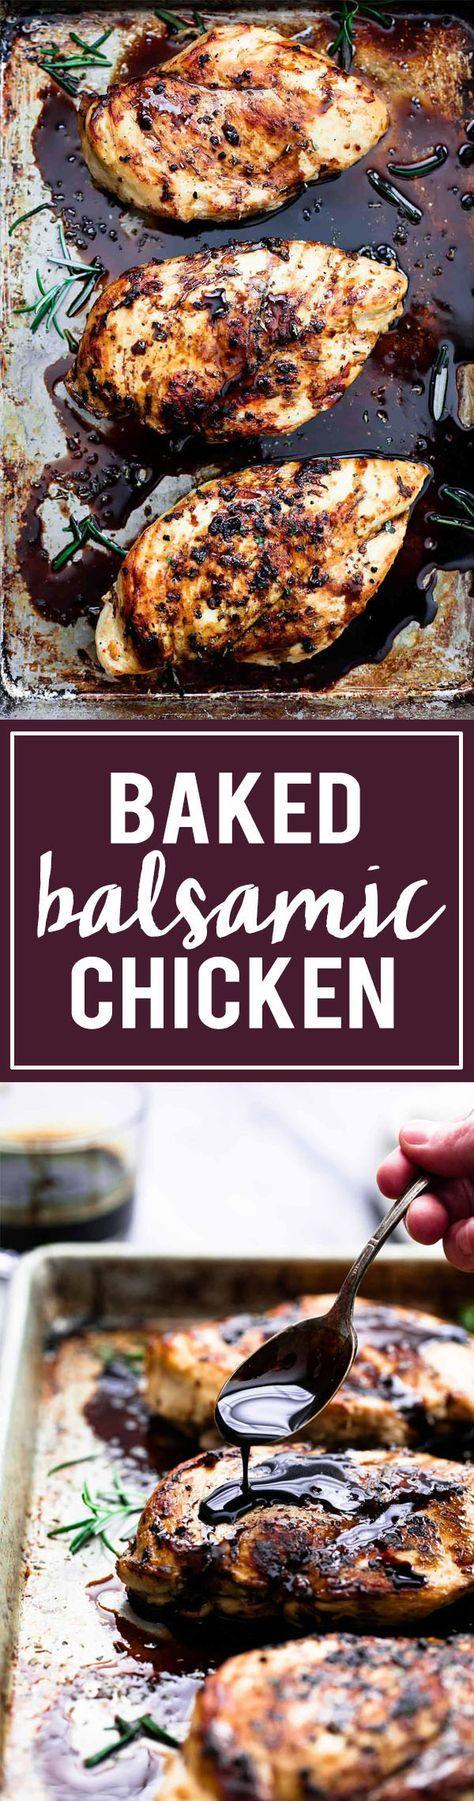 Easy Healthy 30 Minute Baked Balsamic Chicken   Creme de la Crumb (Balsamic Chicken Marinade)